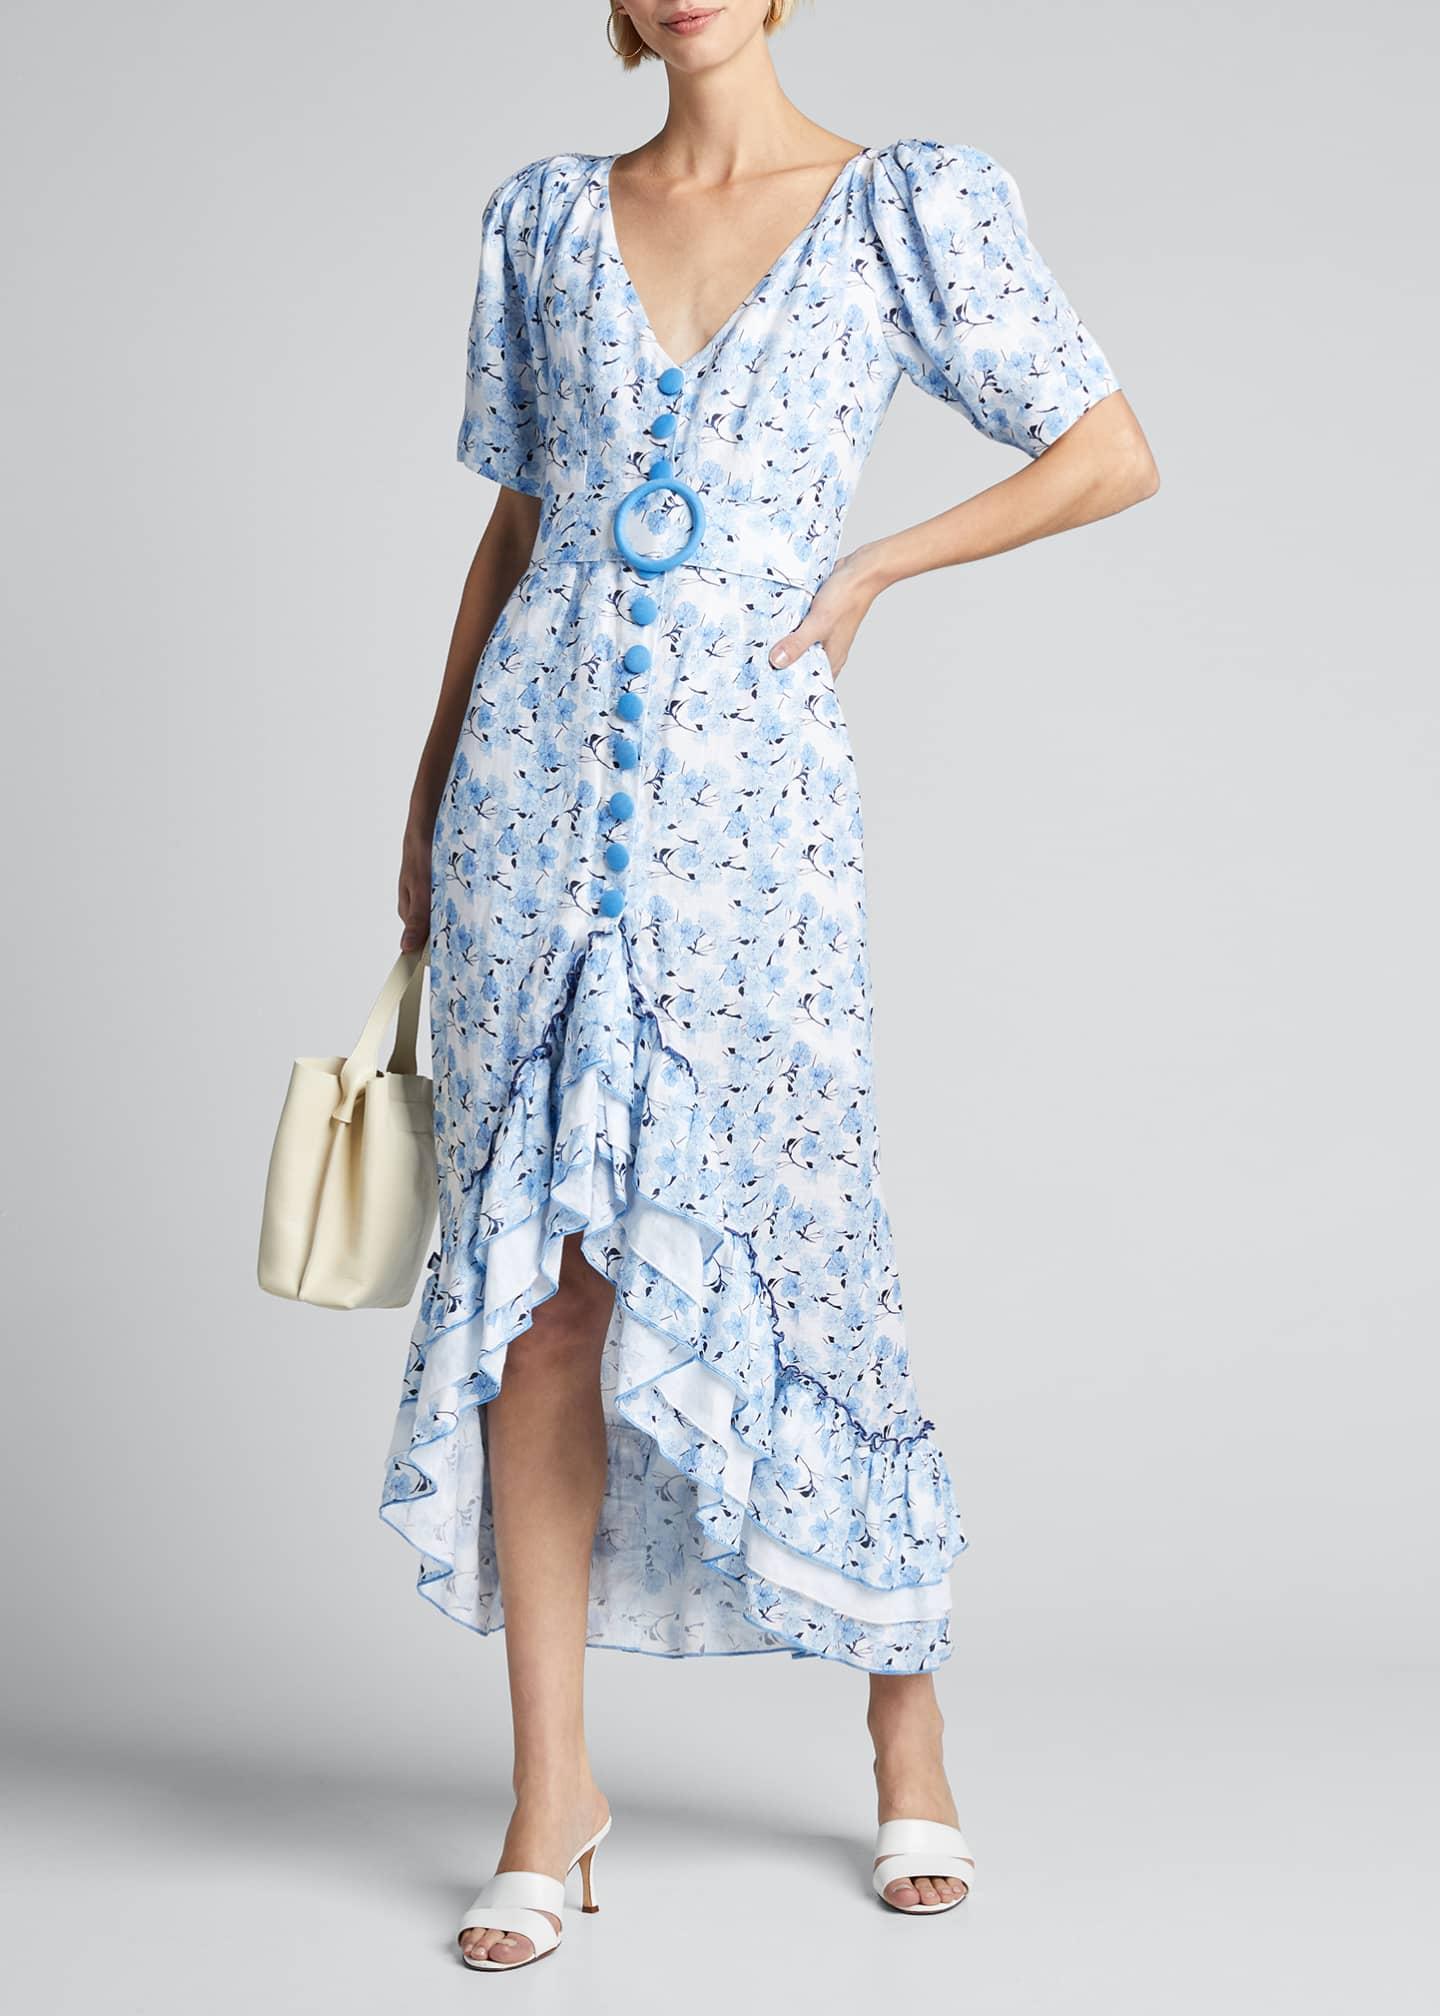 Gul Hurgel Puff-Sleeve Button-Down Belted Frill Dress